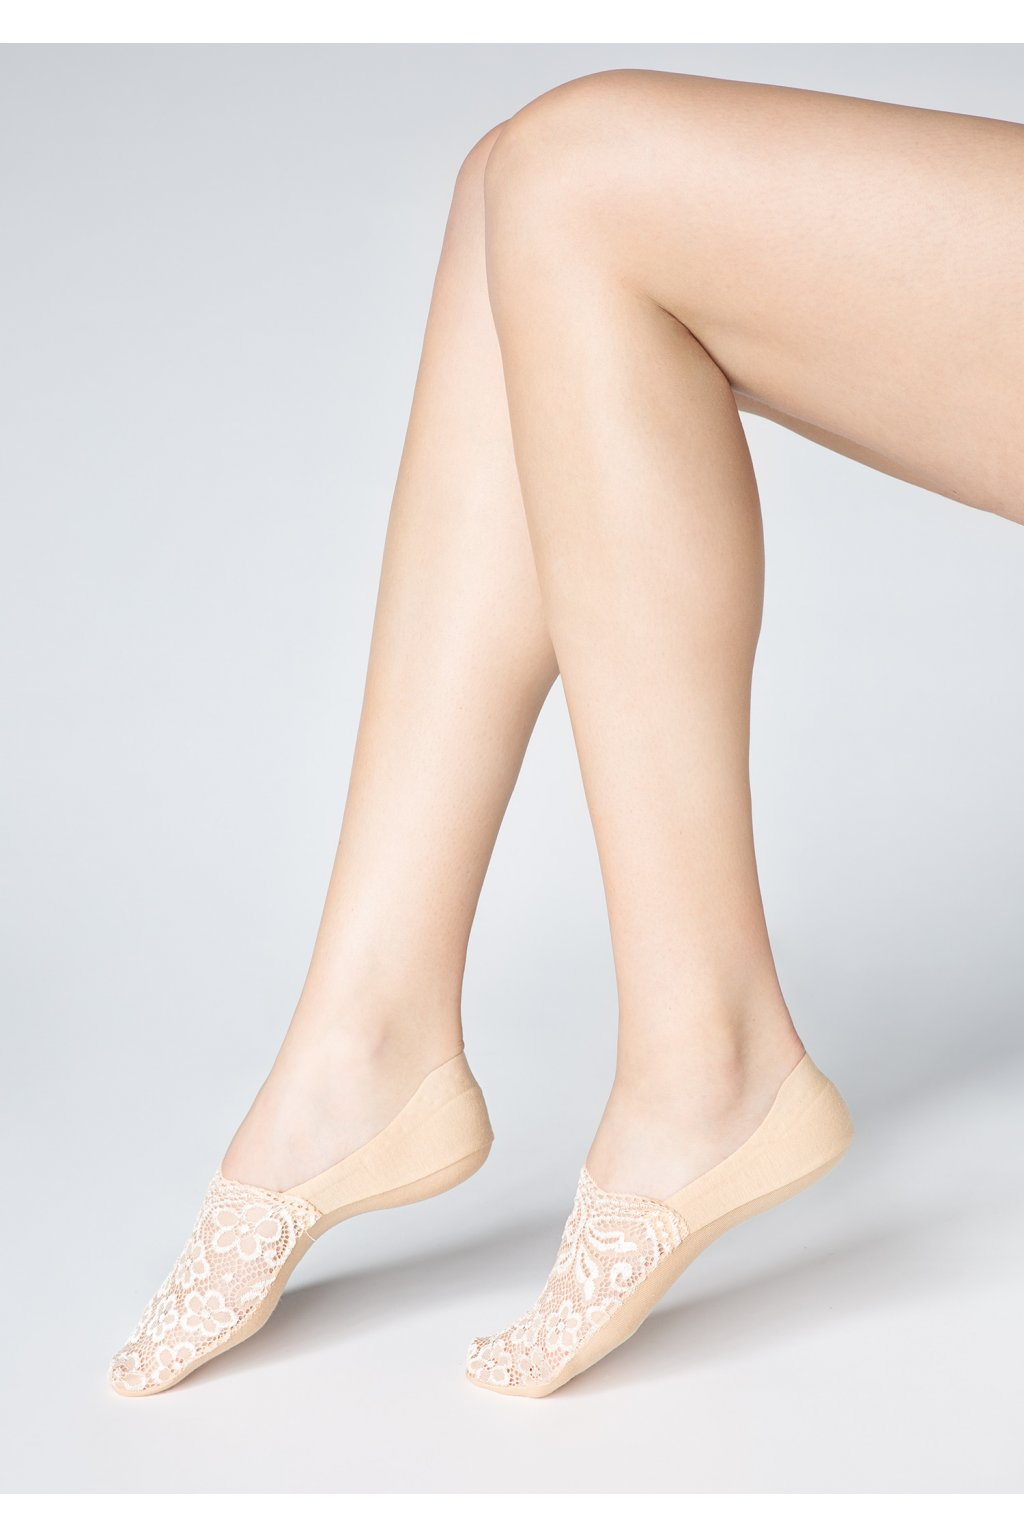 https://golden-legs.com.ua/images/stories/virtuemart/product/2936-2_nizke-krajkove-ponozky-high-p36.jpg